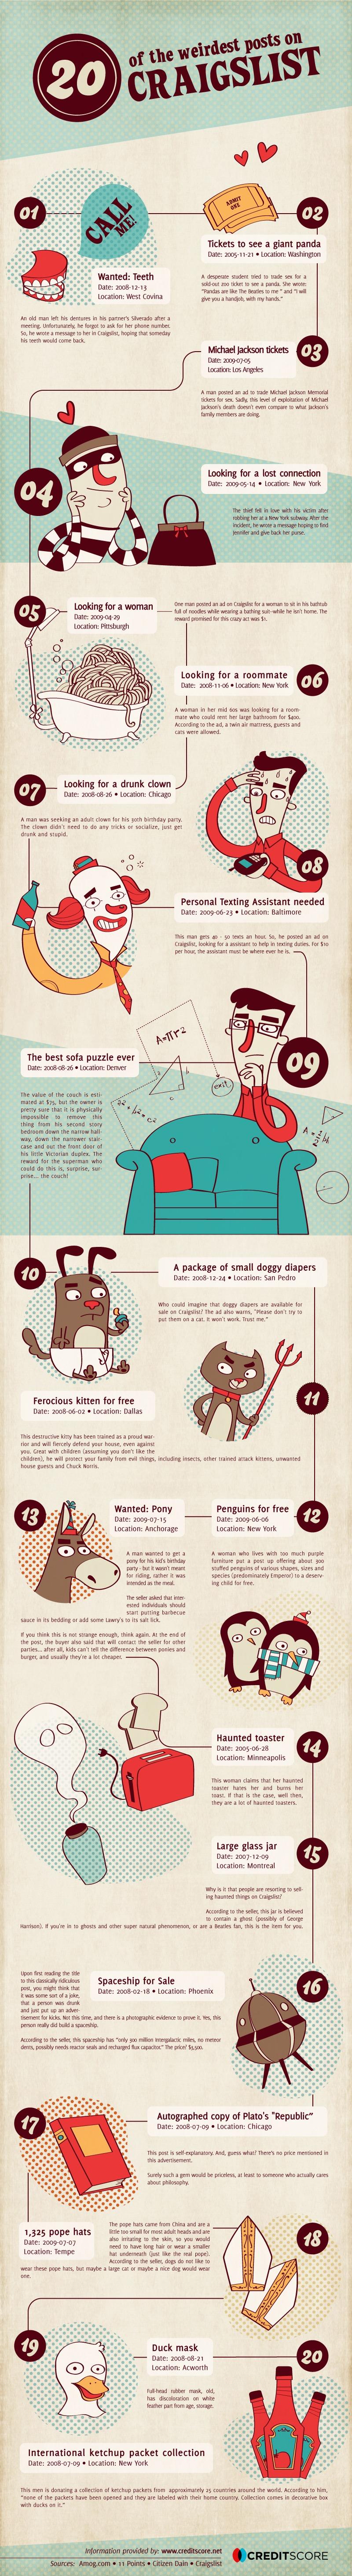 Craigslist-Infographic